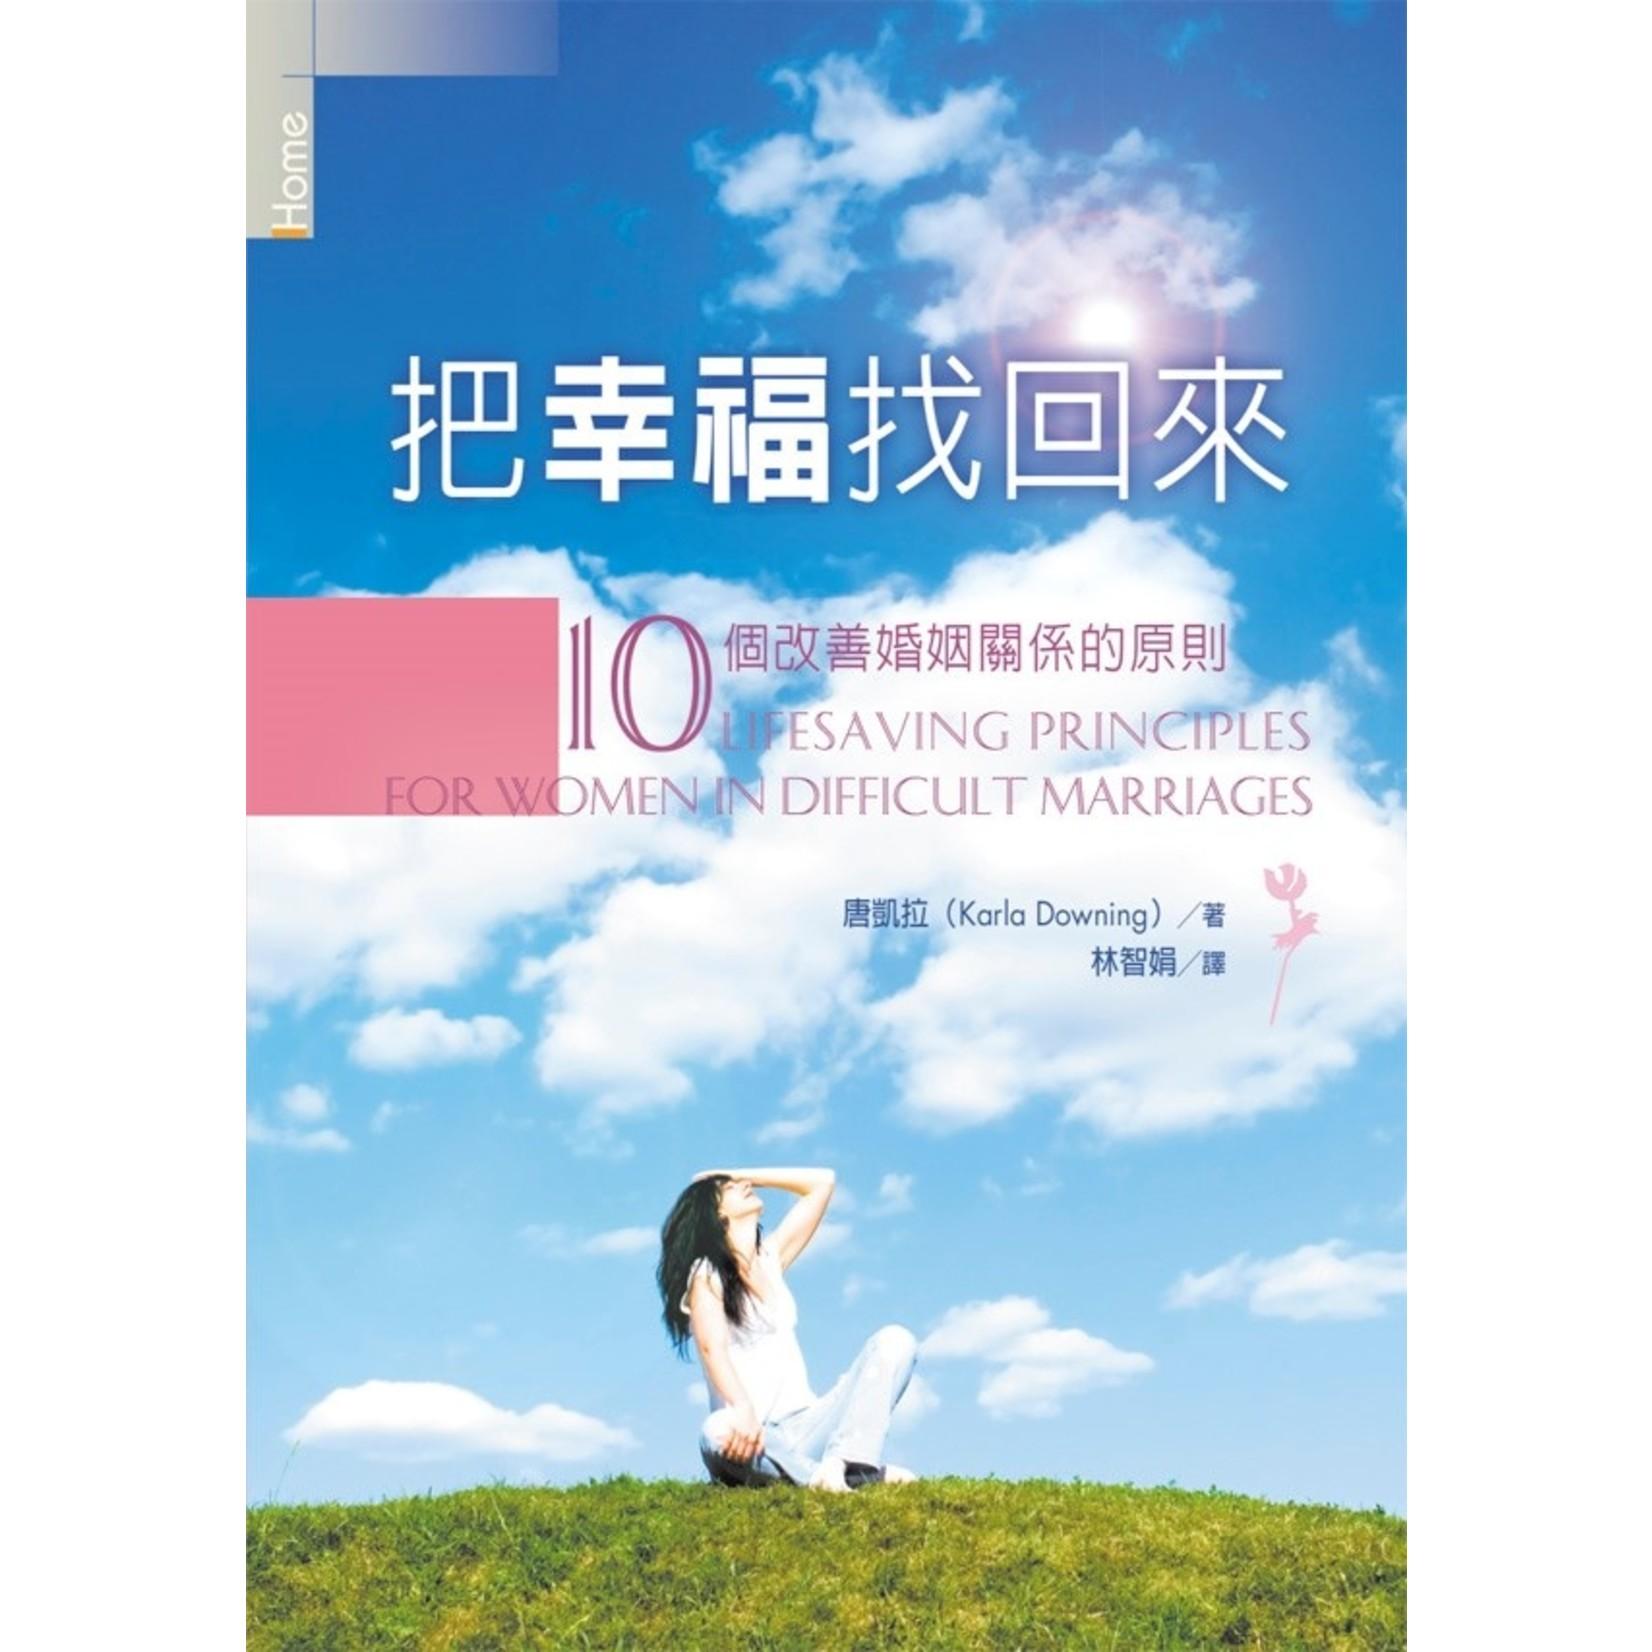 校園書房 Campus Books 把幸福找回來:10個改善婚姻關係的原則 10 Lifesaving Principles for Women in Difficult Marriages